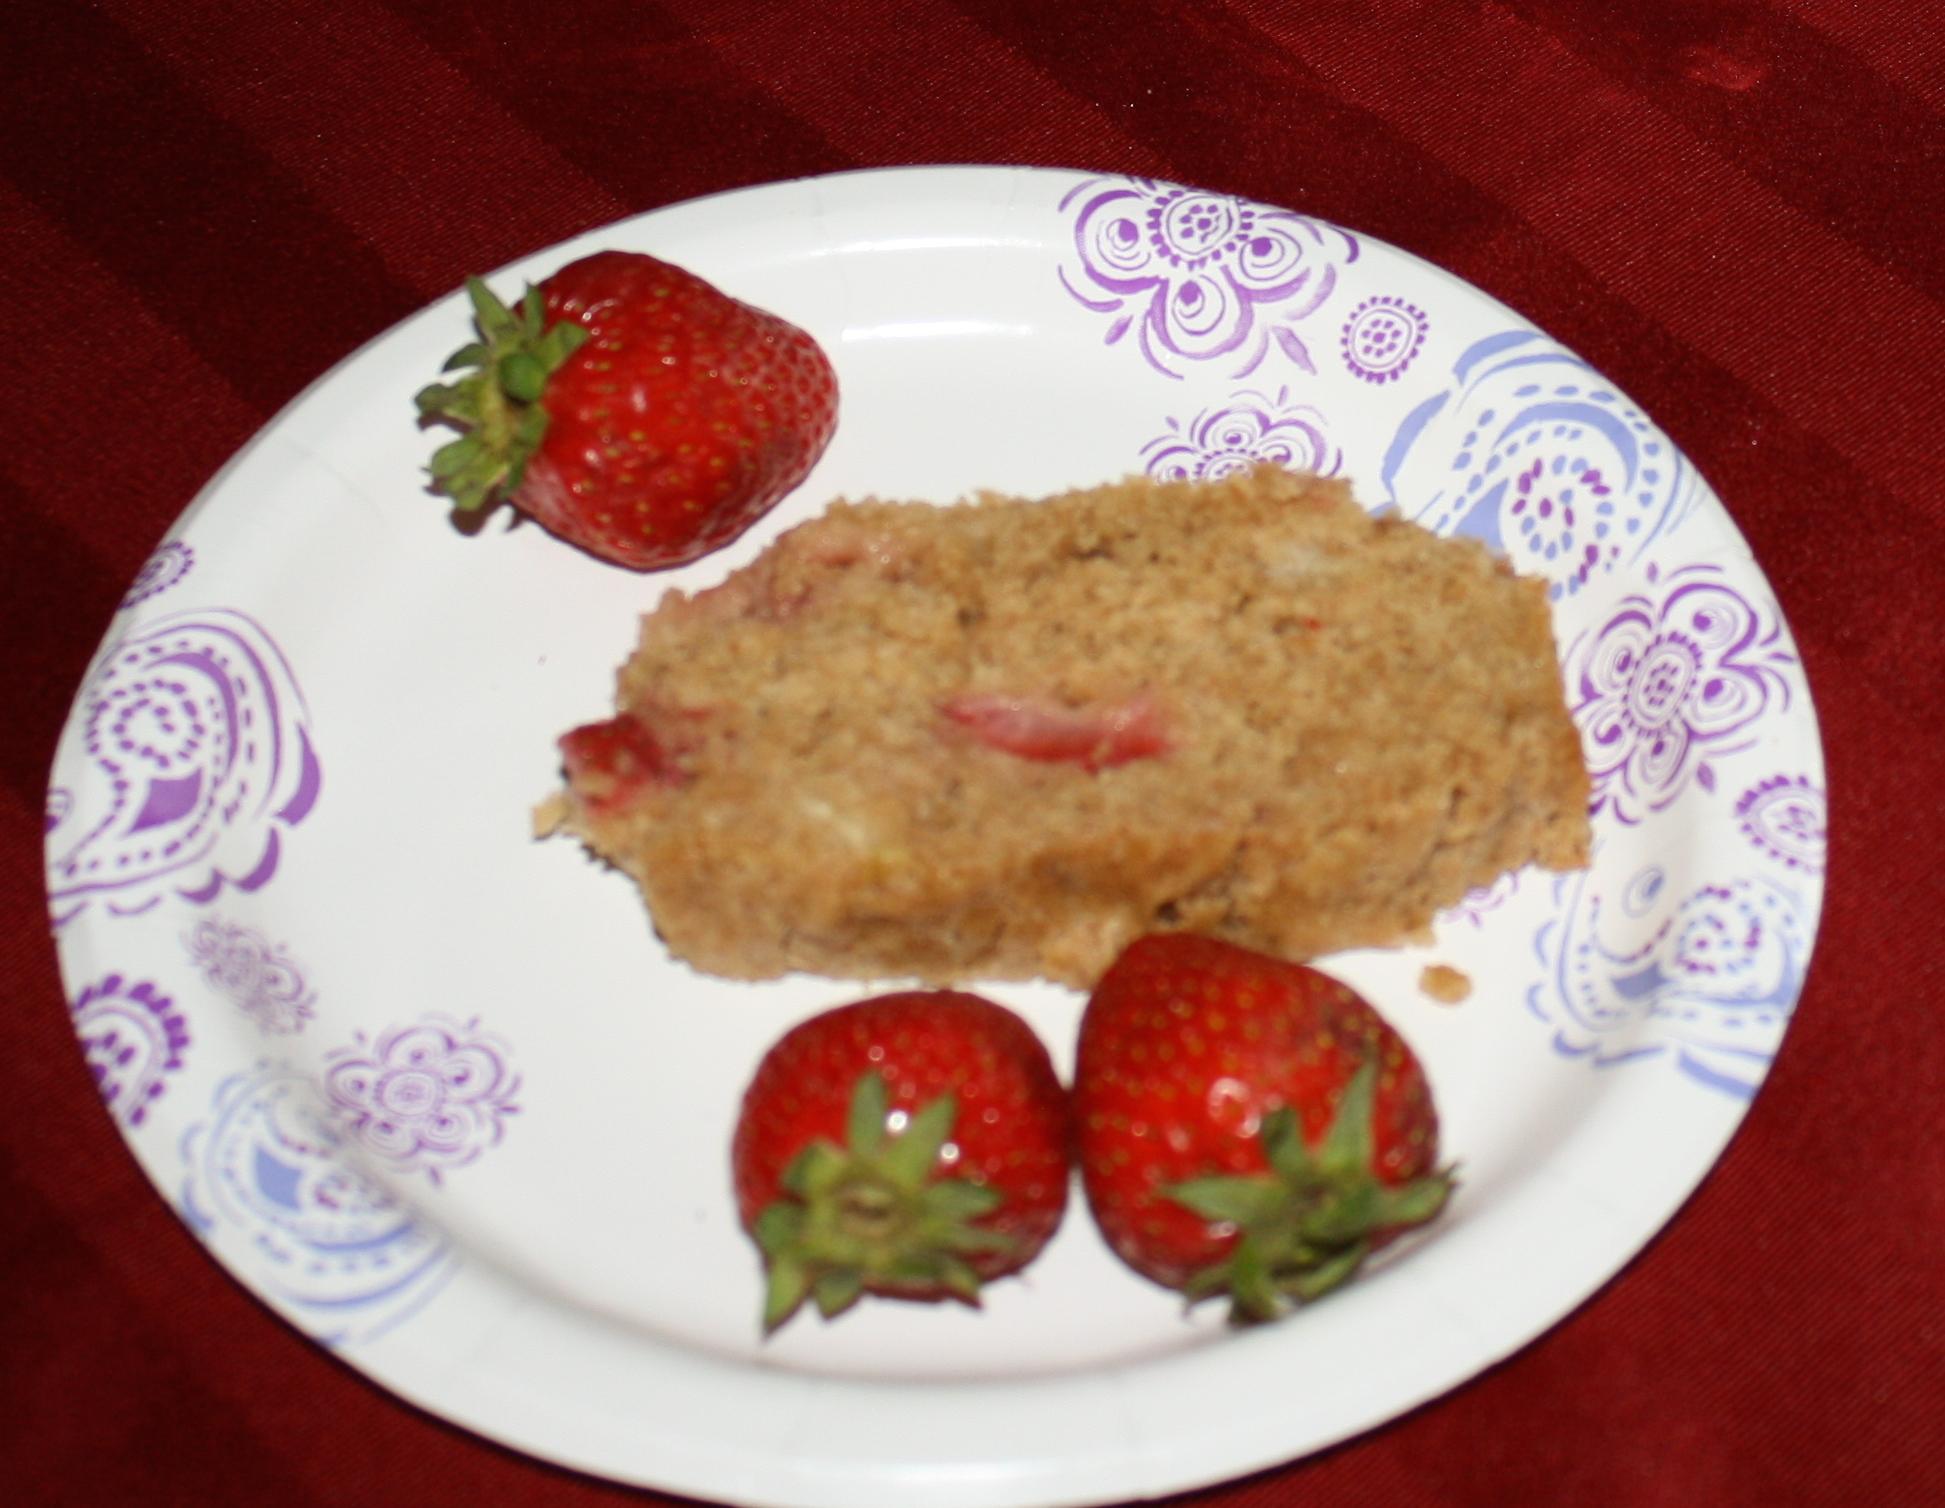 a slice of strawberry banana bread garnished with three fresh strawberries